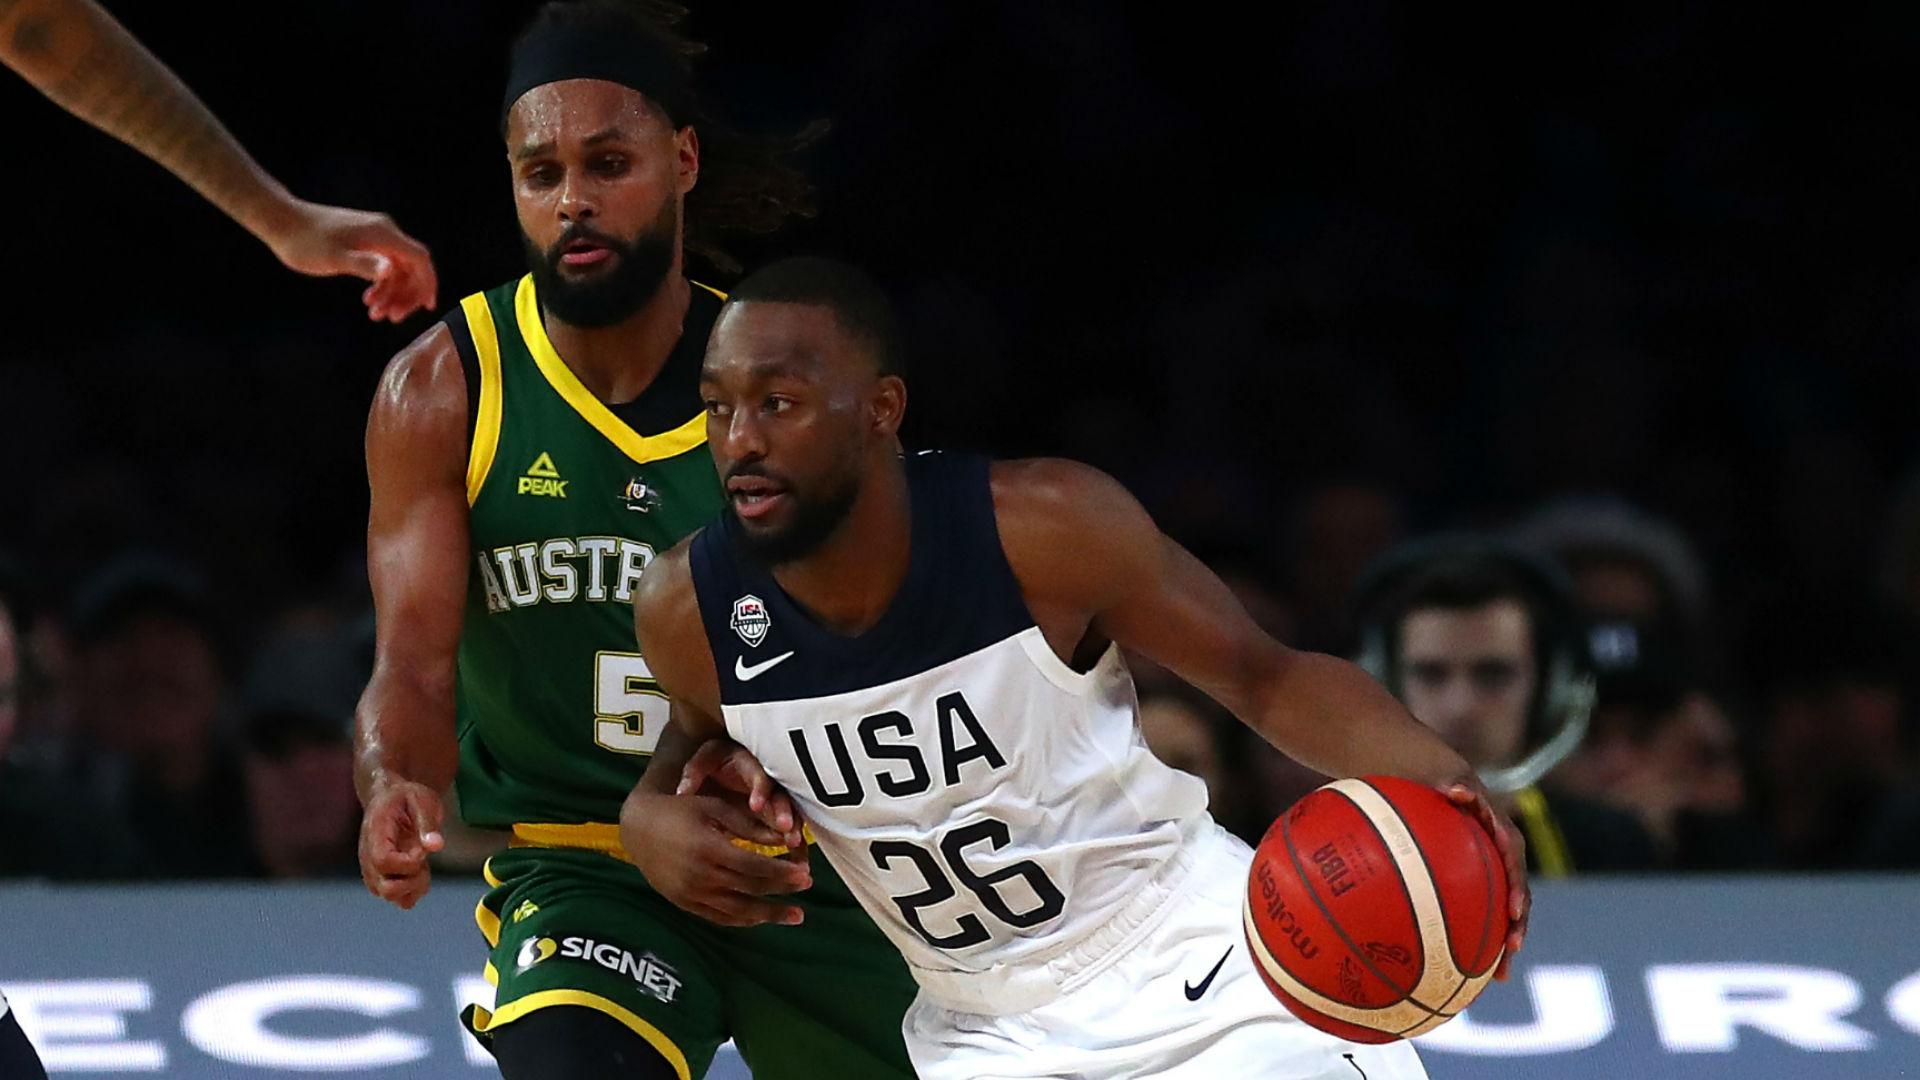 FIBA World Cup 2019: Three takeaways from Team USA's 102-86 win over Australian Boomers